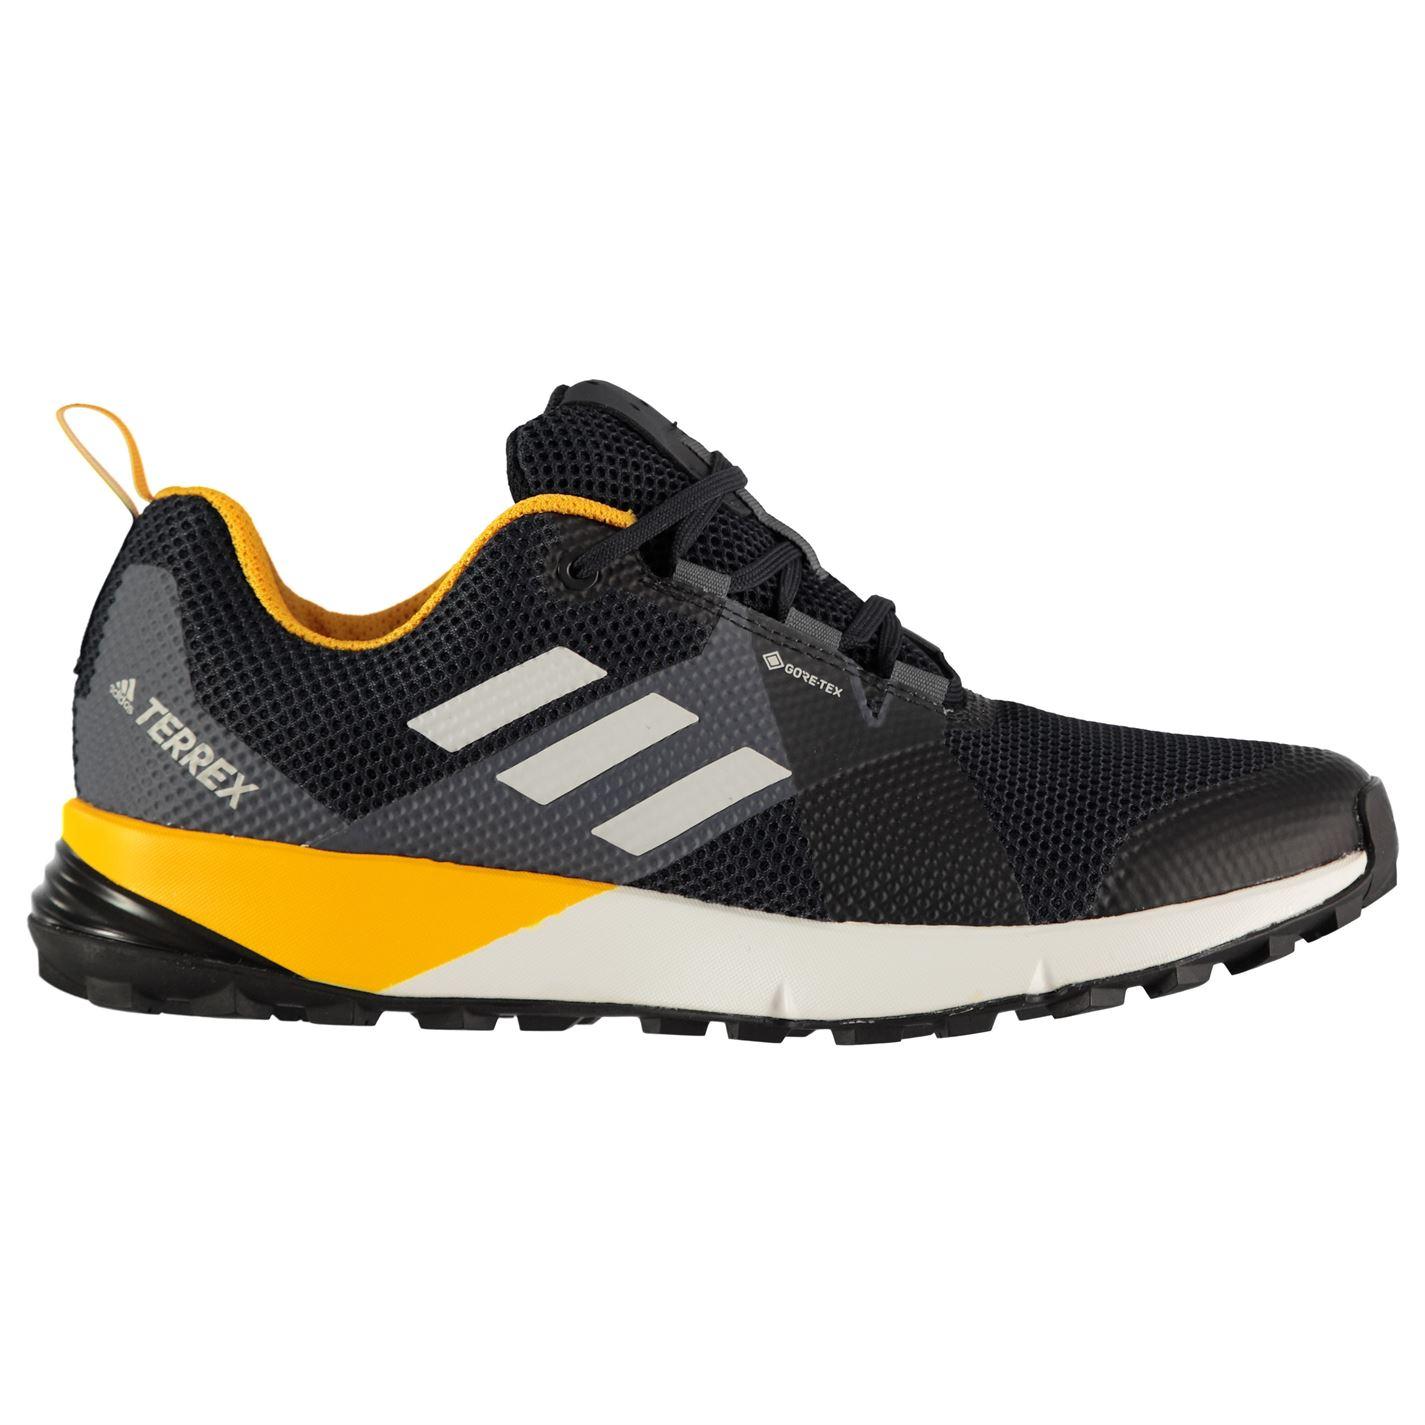 Adidas Terrex 2 GTX Sn02